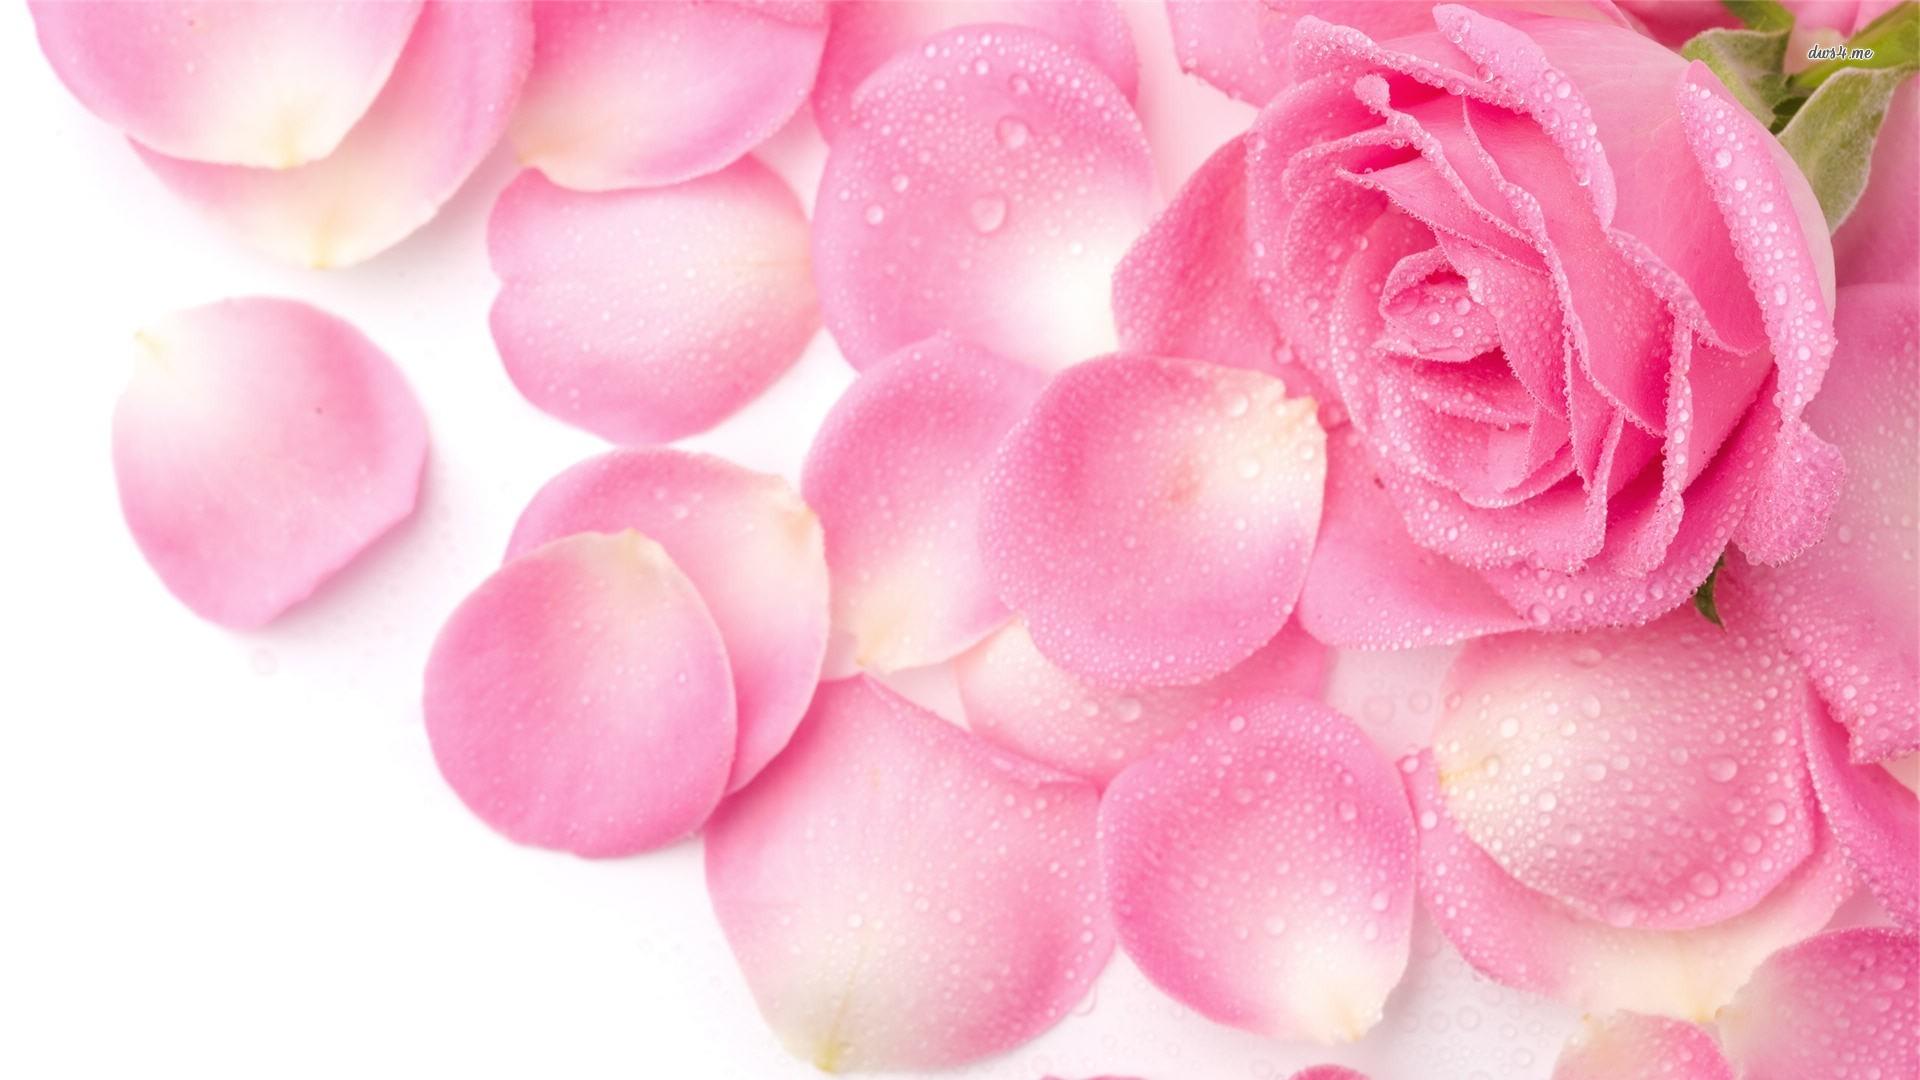 HD Wallpapers 1080p Pink Rose Petals